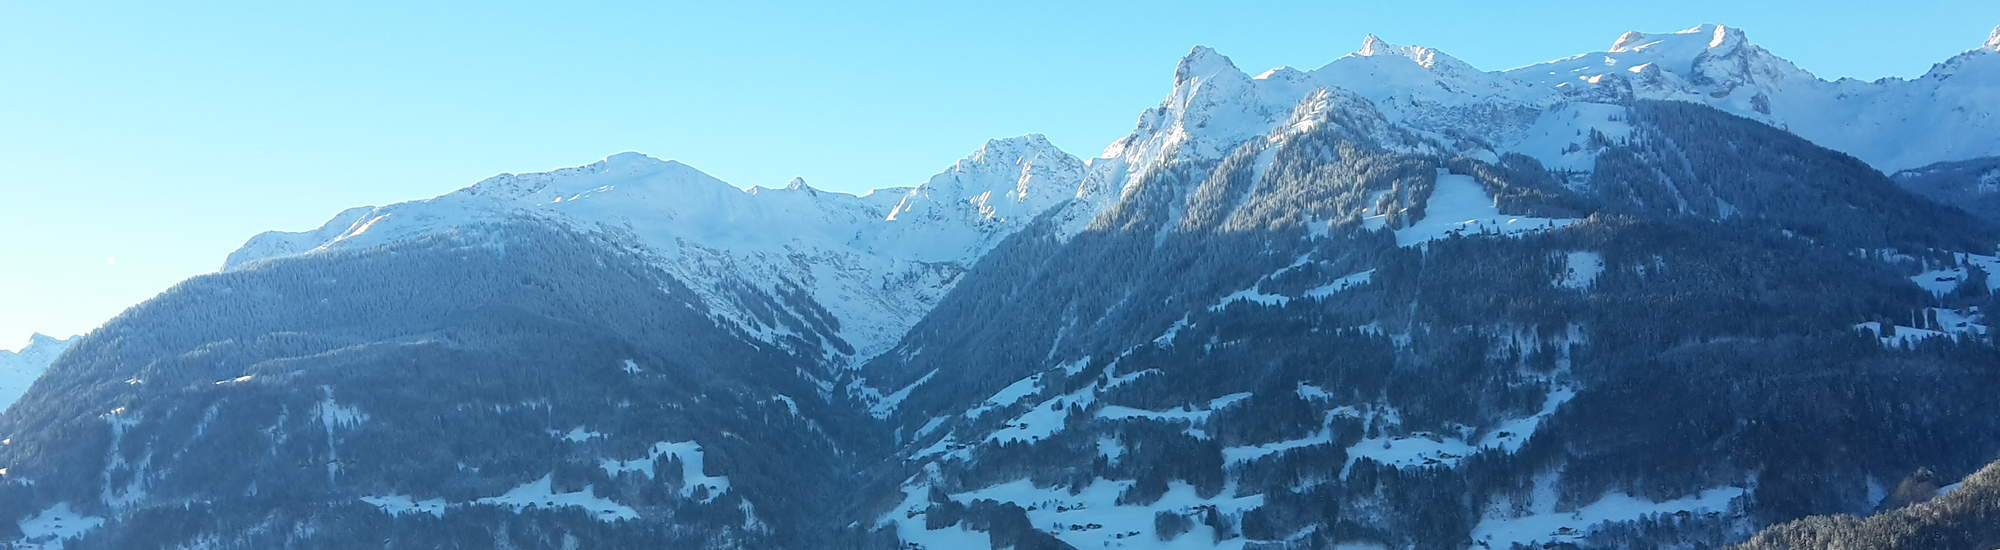 hotel-bergerhof-winterurlaub-montafon-76-s